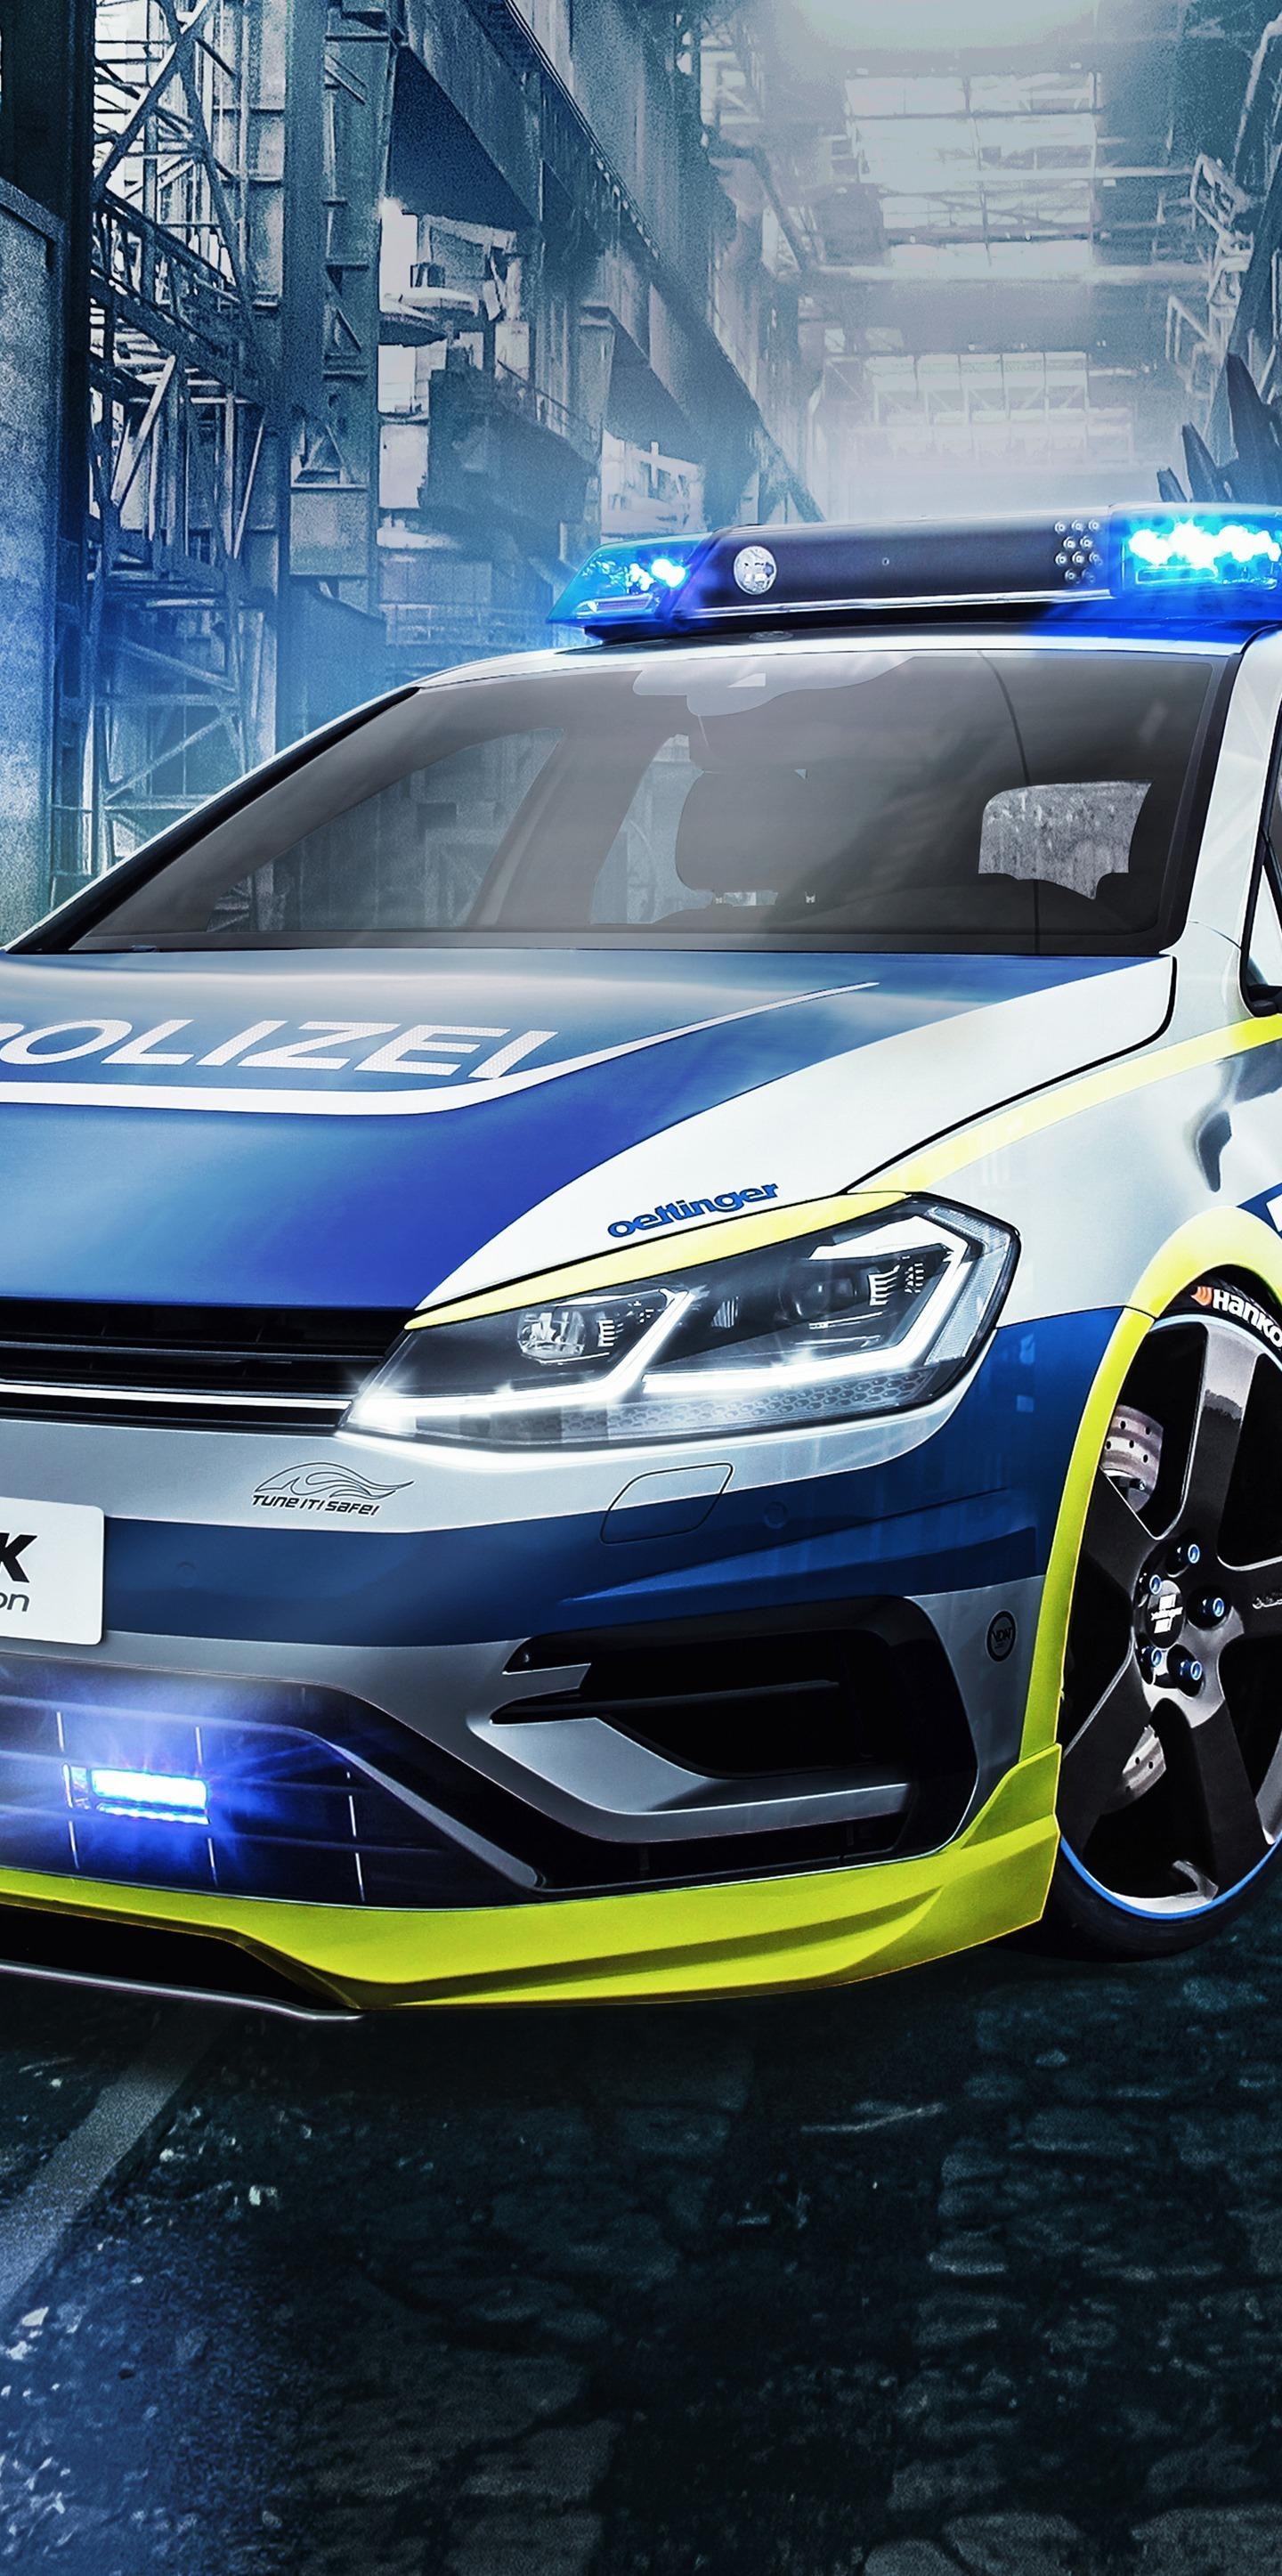 Oettinger Volkswagen Golf 400r, tune it safe, car, 1440x2960 wallpaper